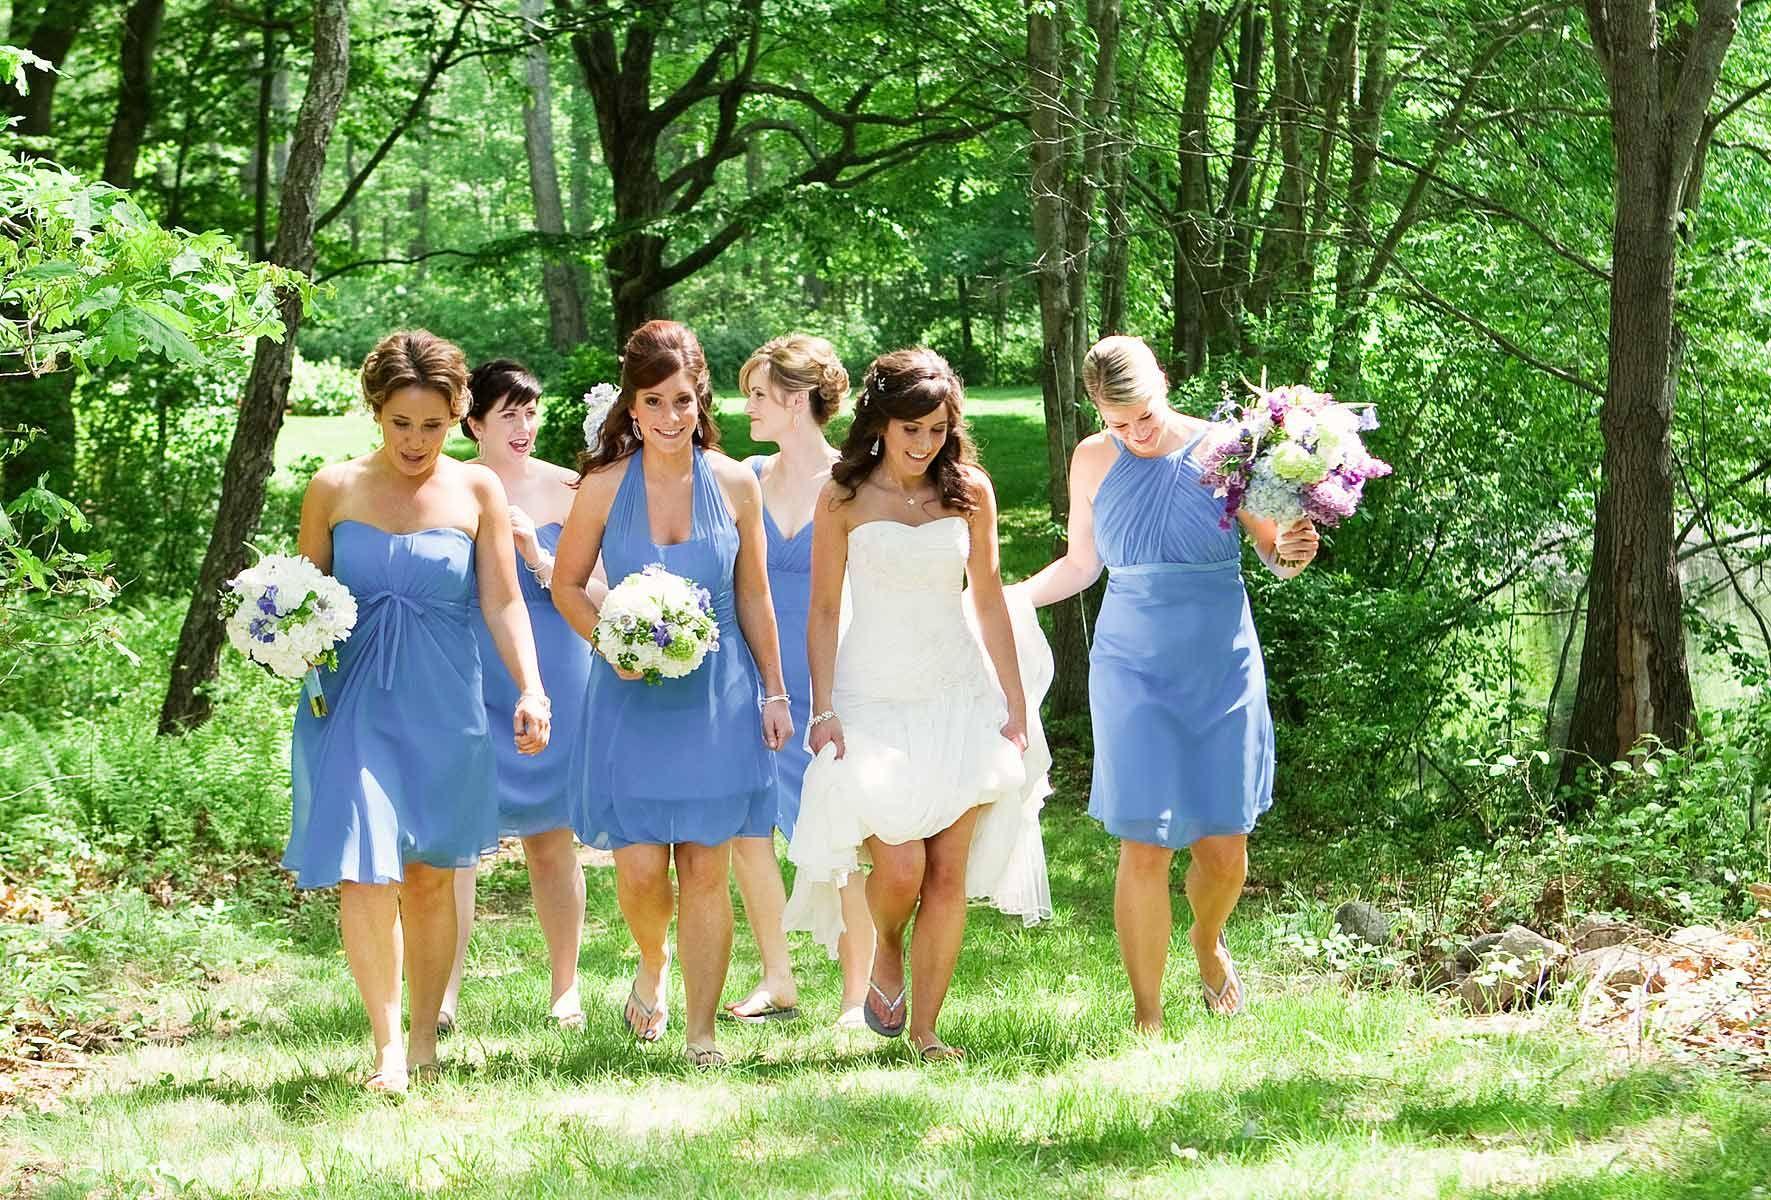 Short periwinkle blue bridesmaids dresses photo by the photo short periwinkle blue bridesmaids dresses photo by the photo agency wedding ombrellifo Image collections